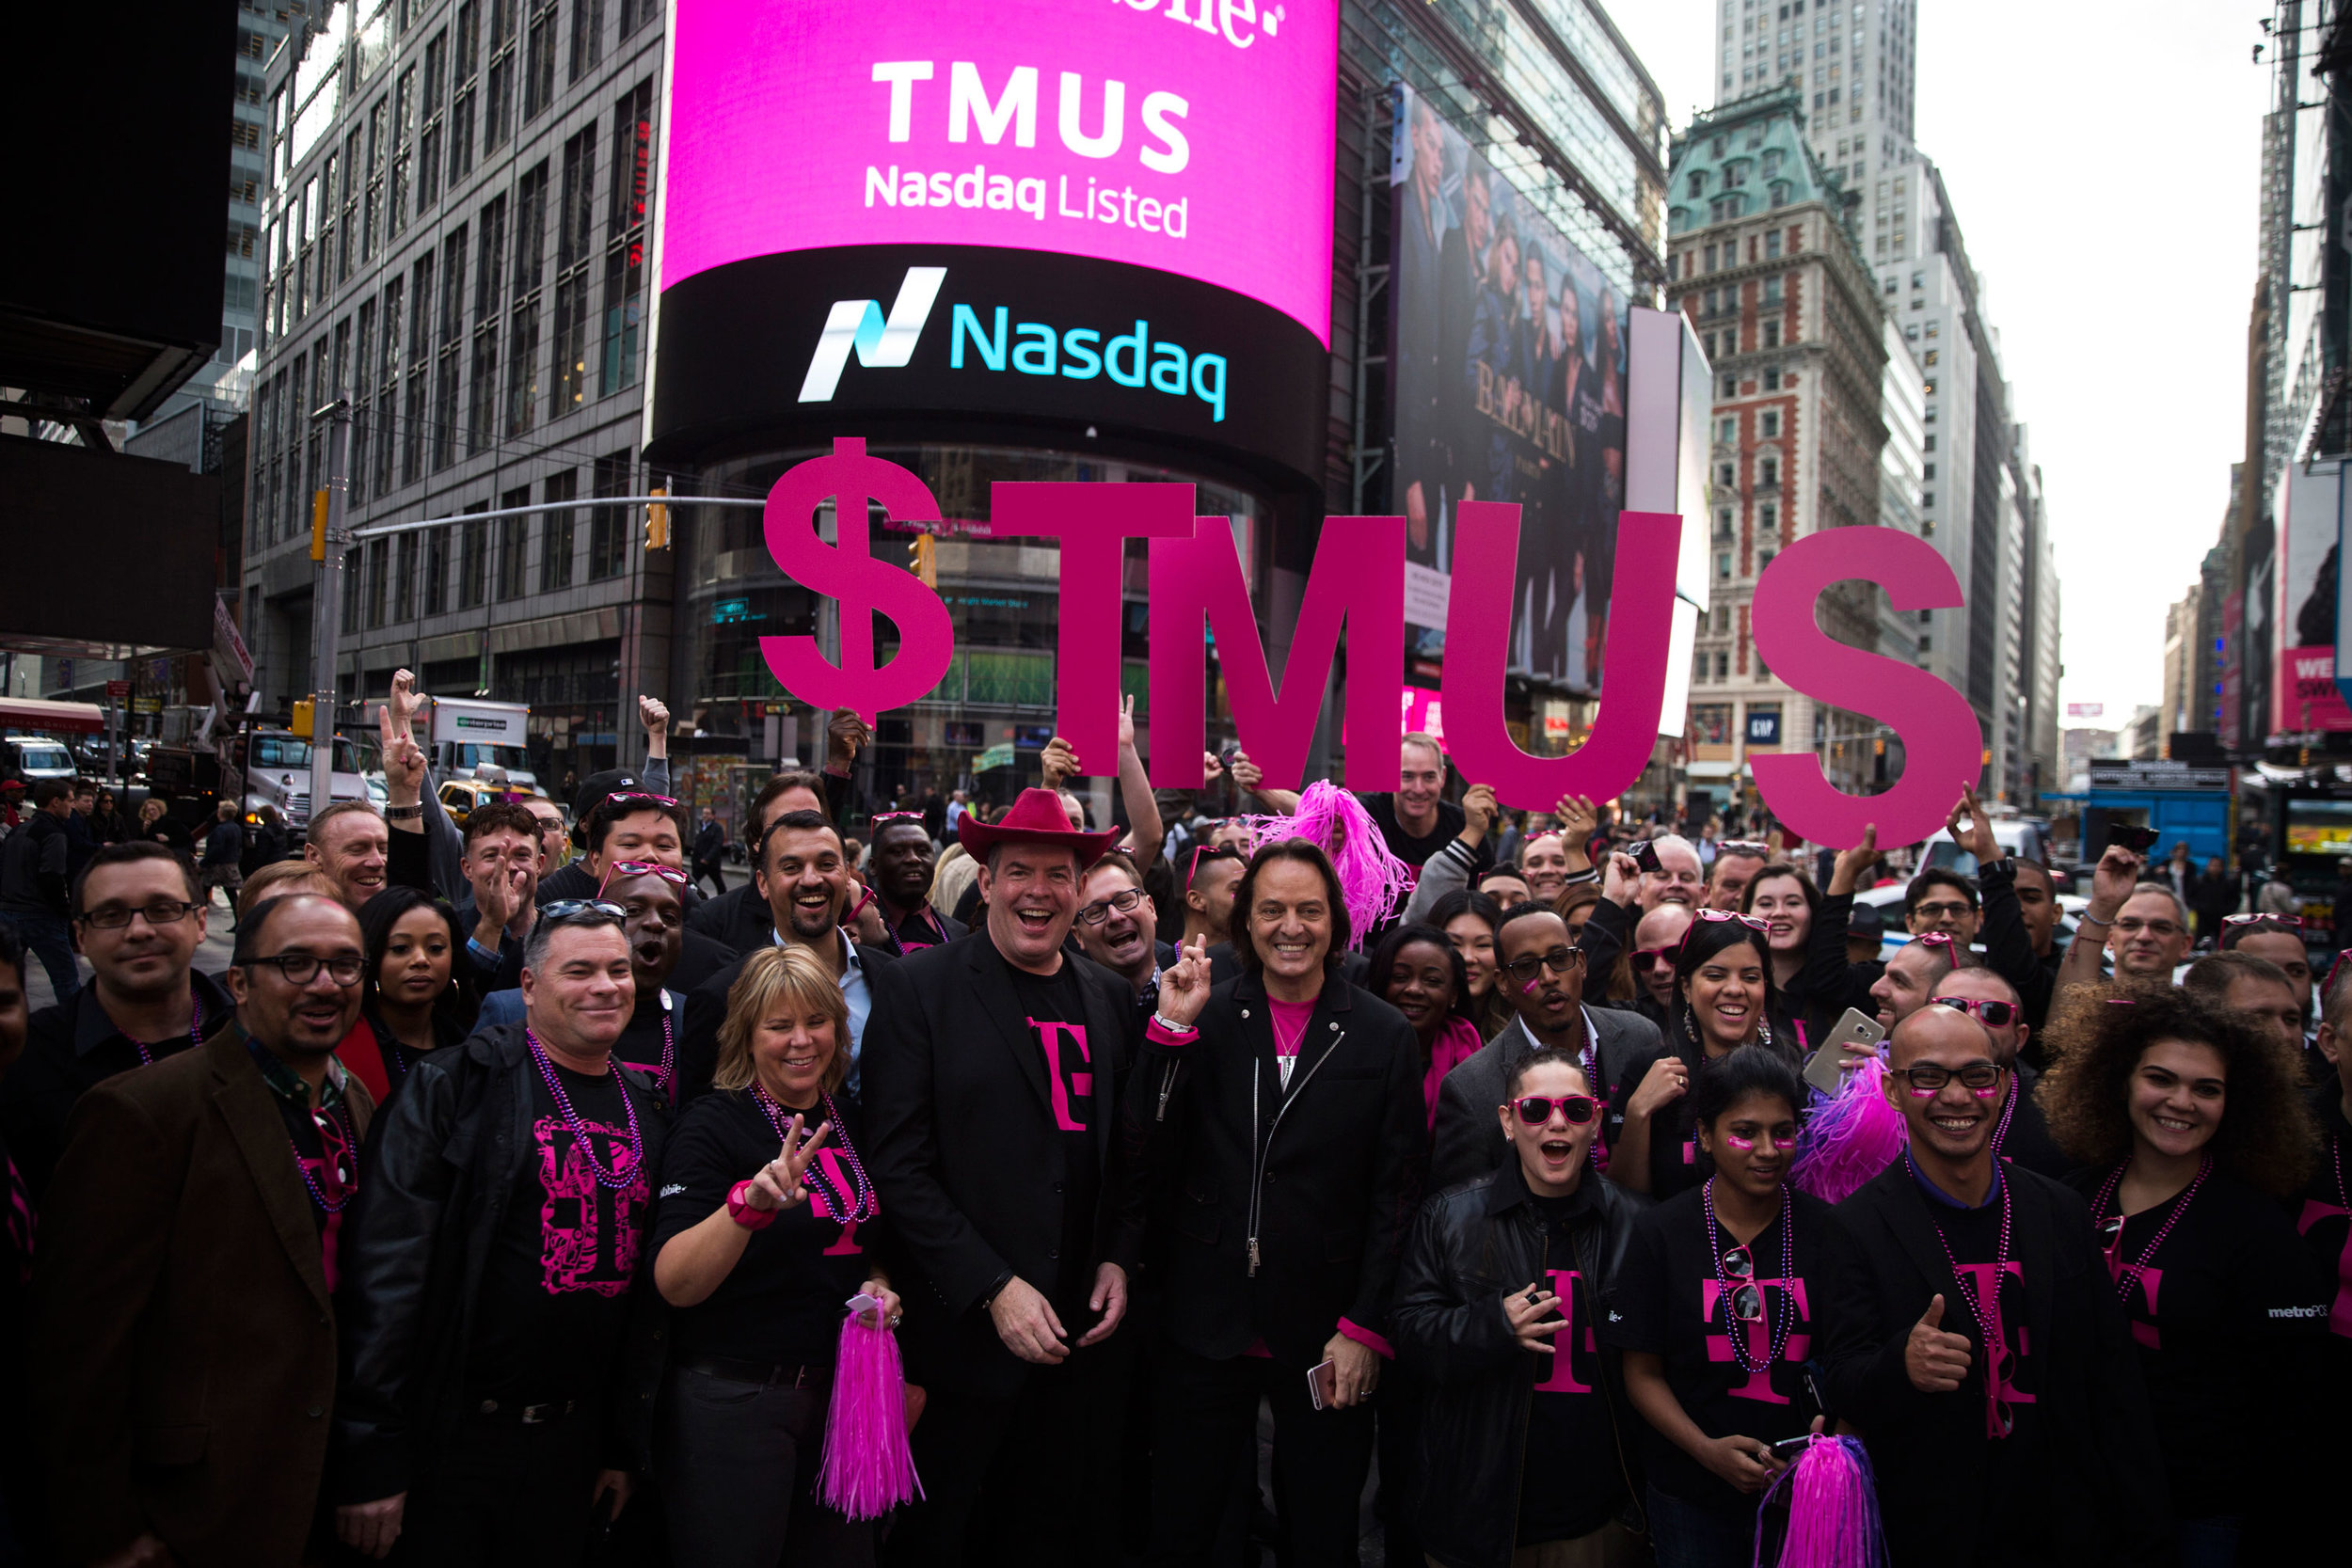 T-mobile_Tuesdays_CodyKussoy_TimeSquare_07.jpg